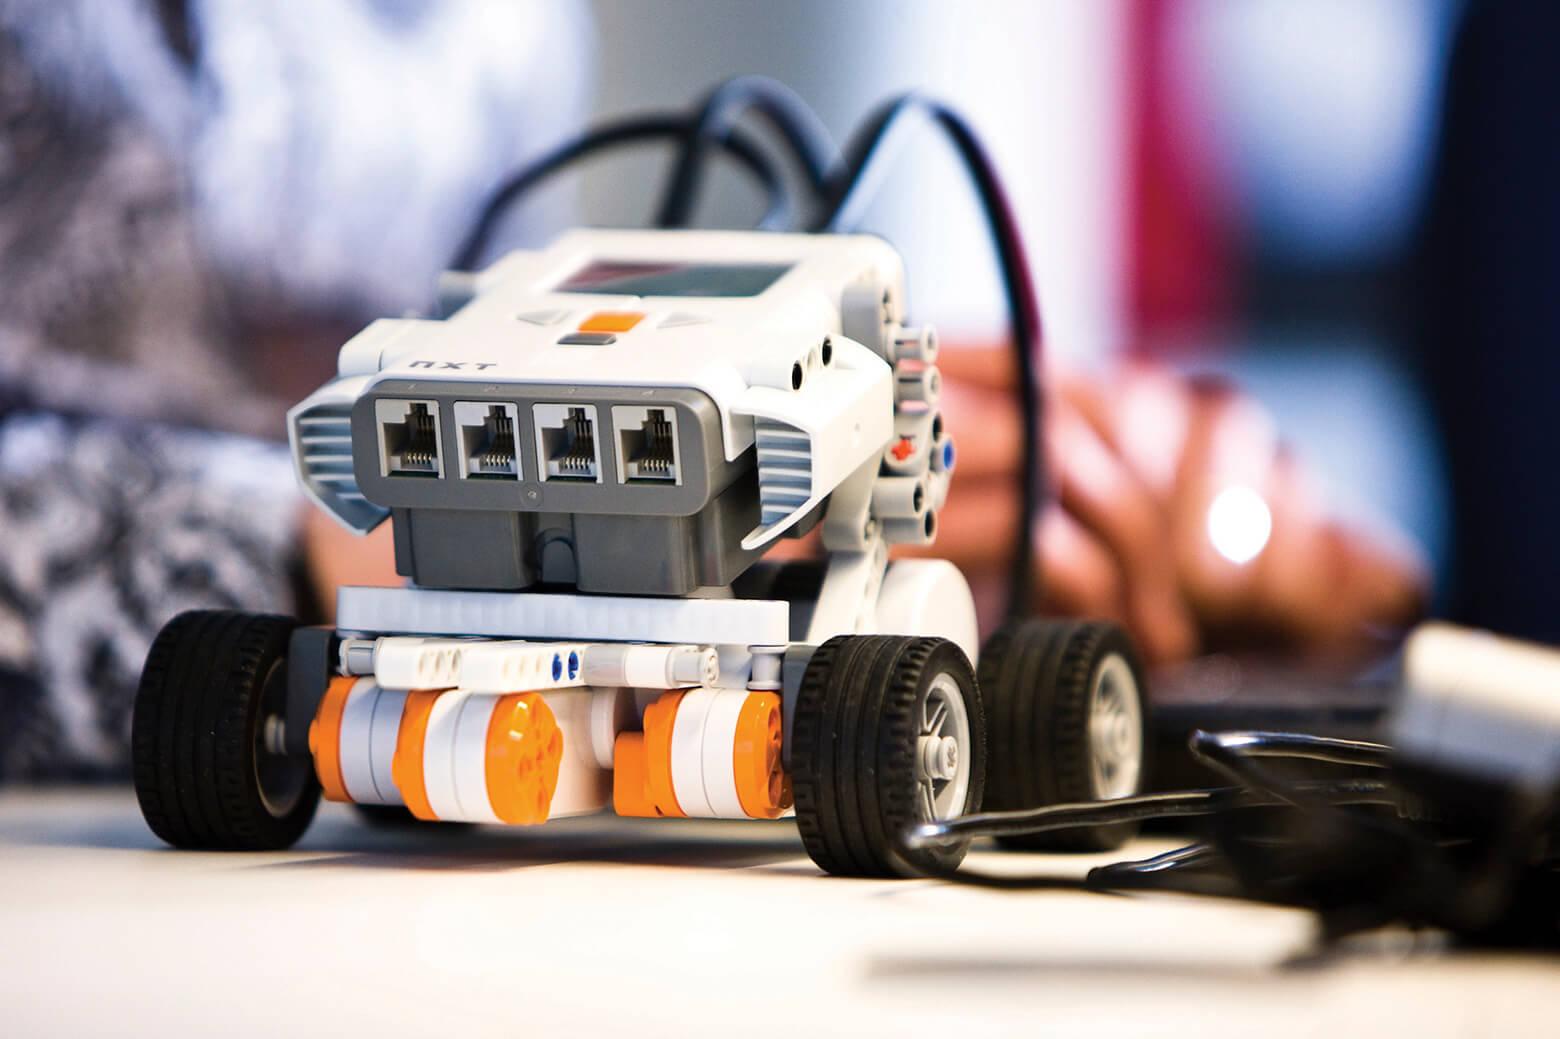 A Lego Mindstorm robot